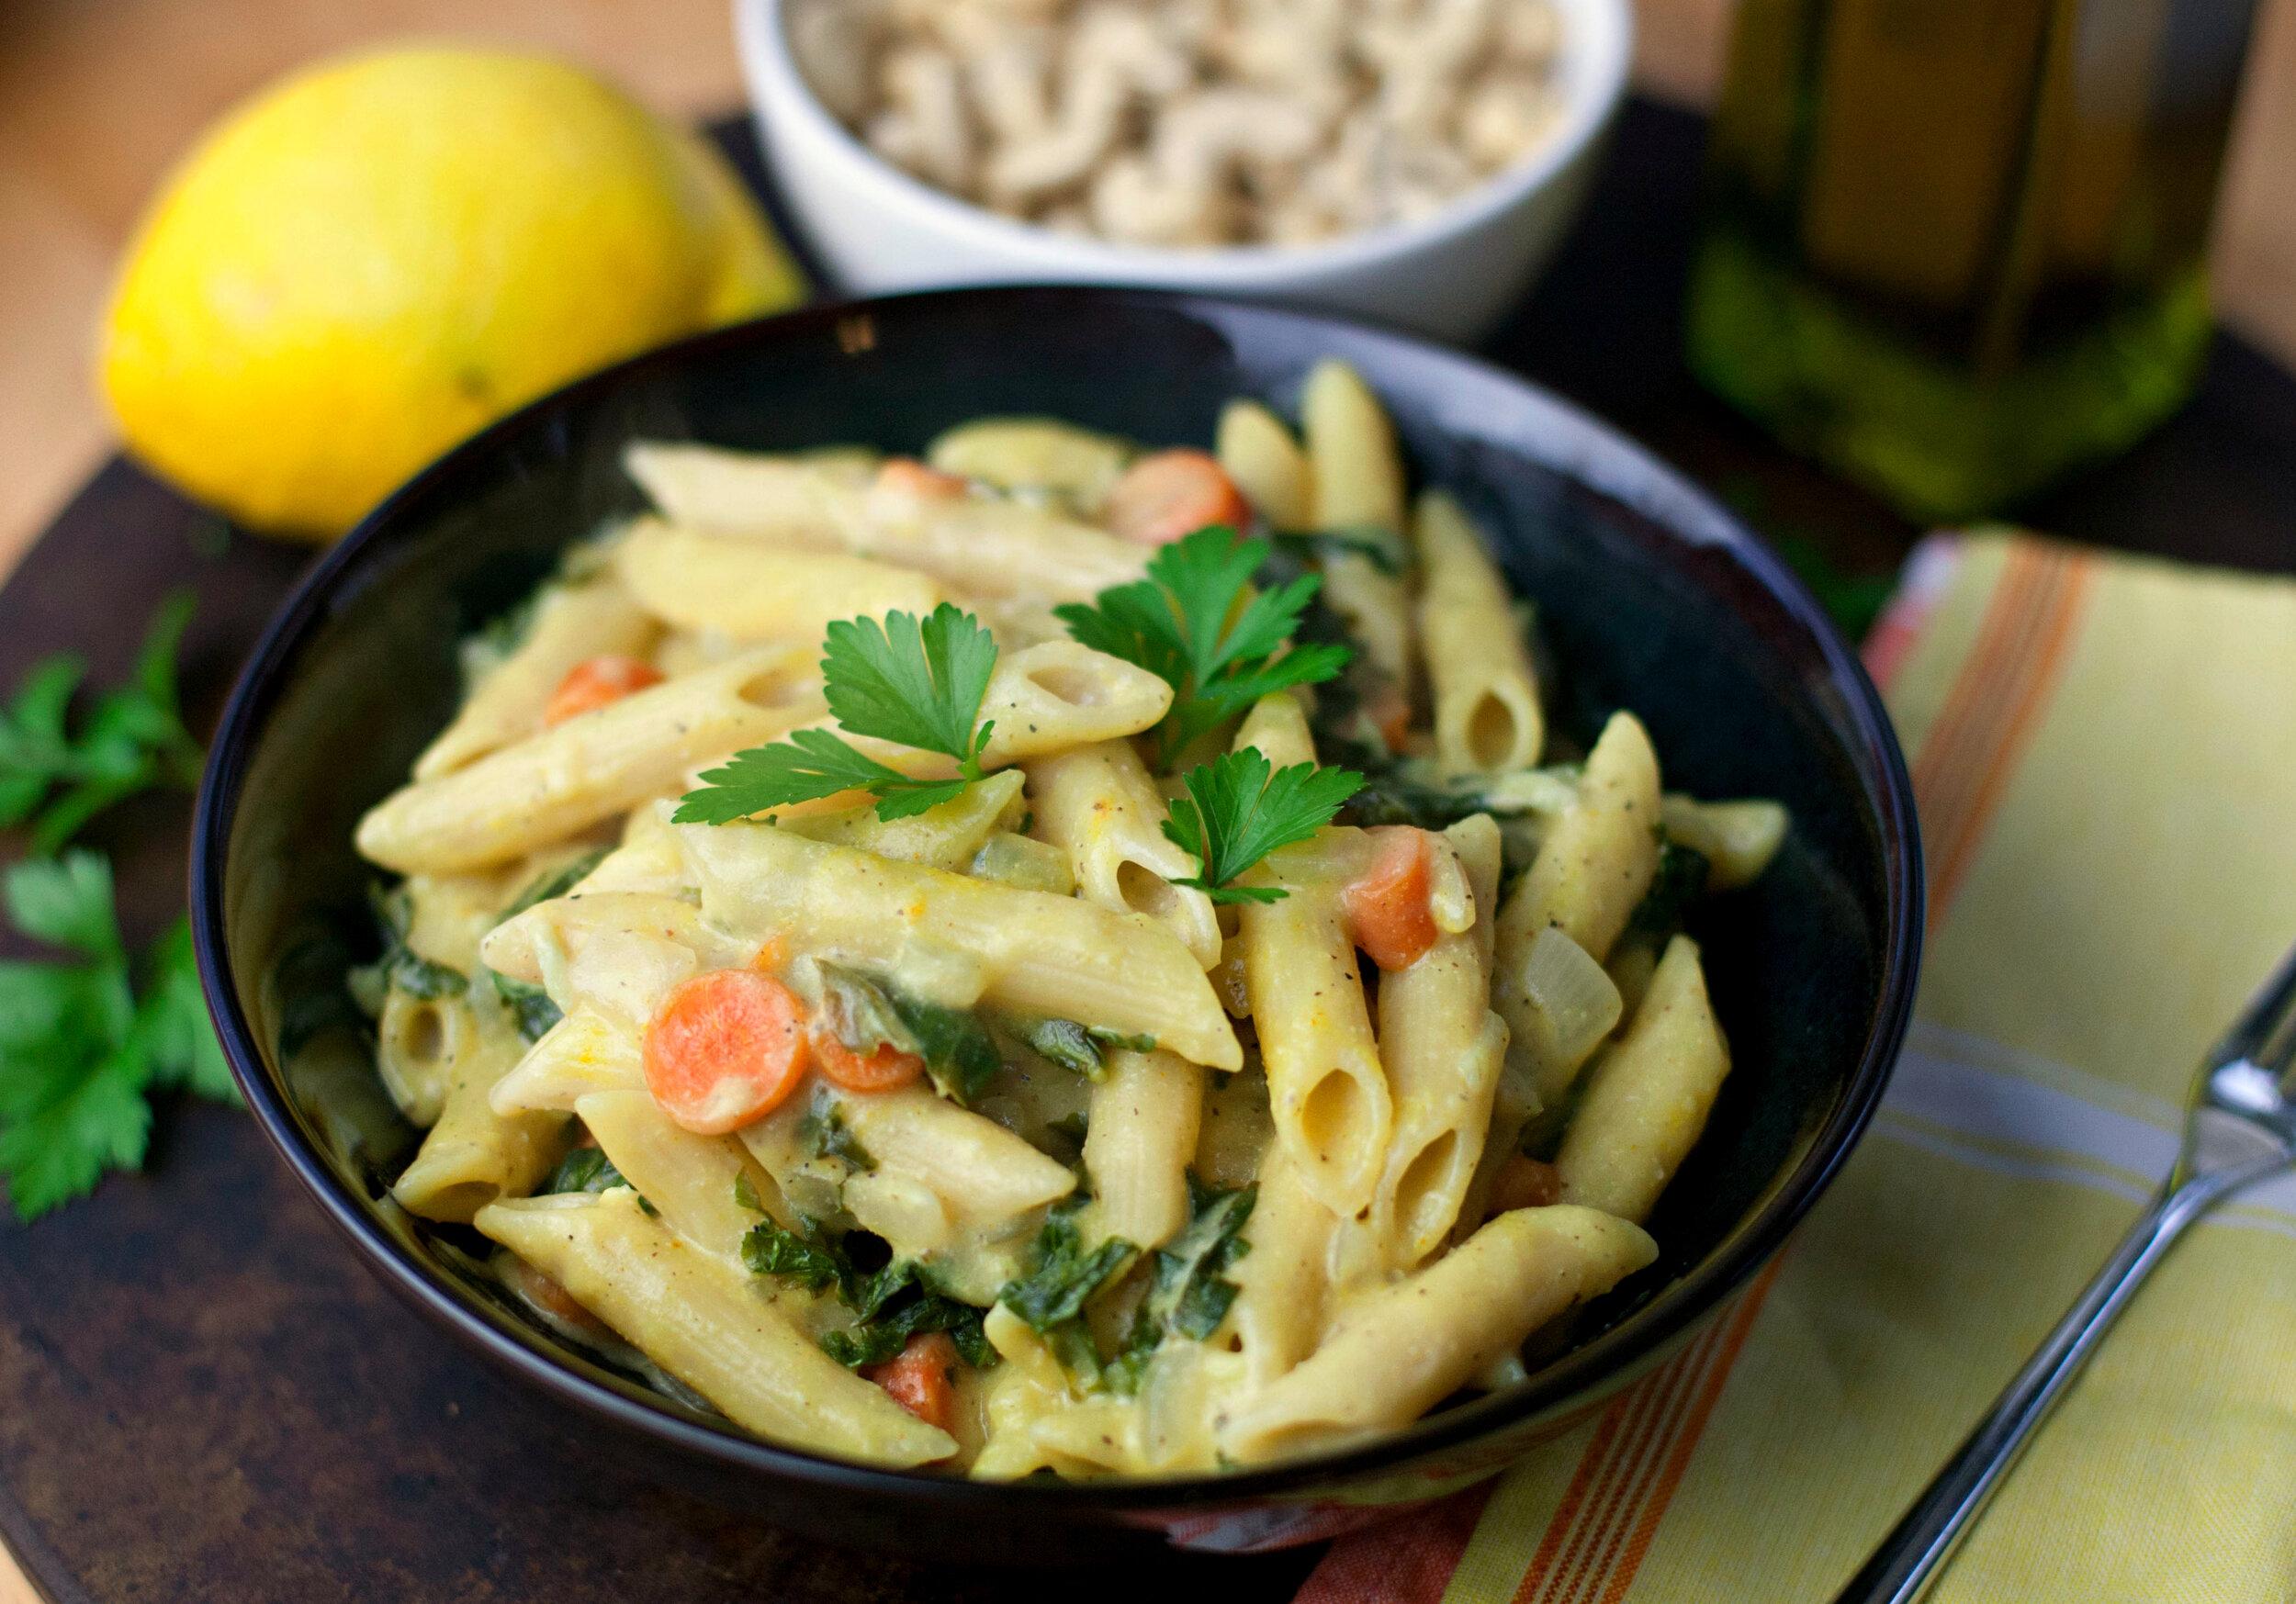 Creamy Lemon Cashew Pasta with Kale